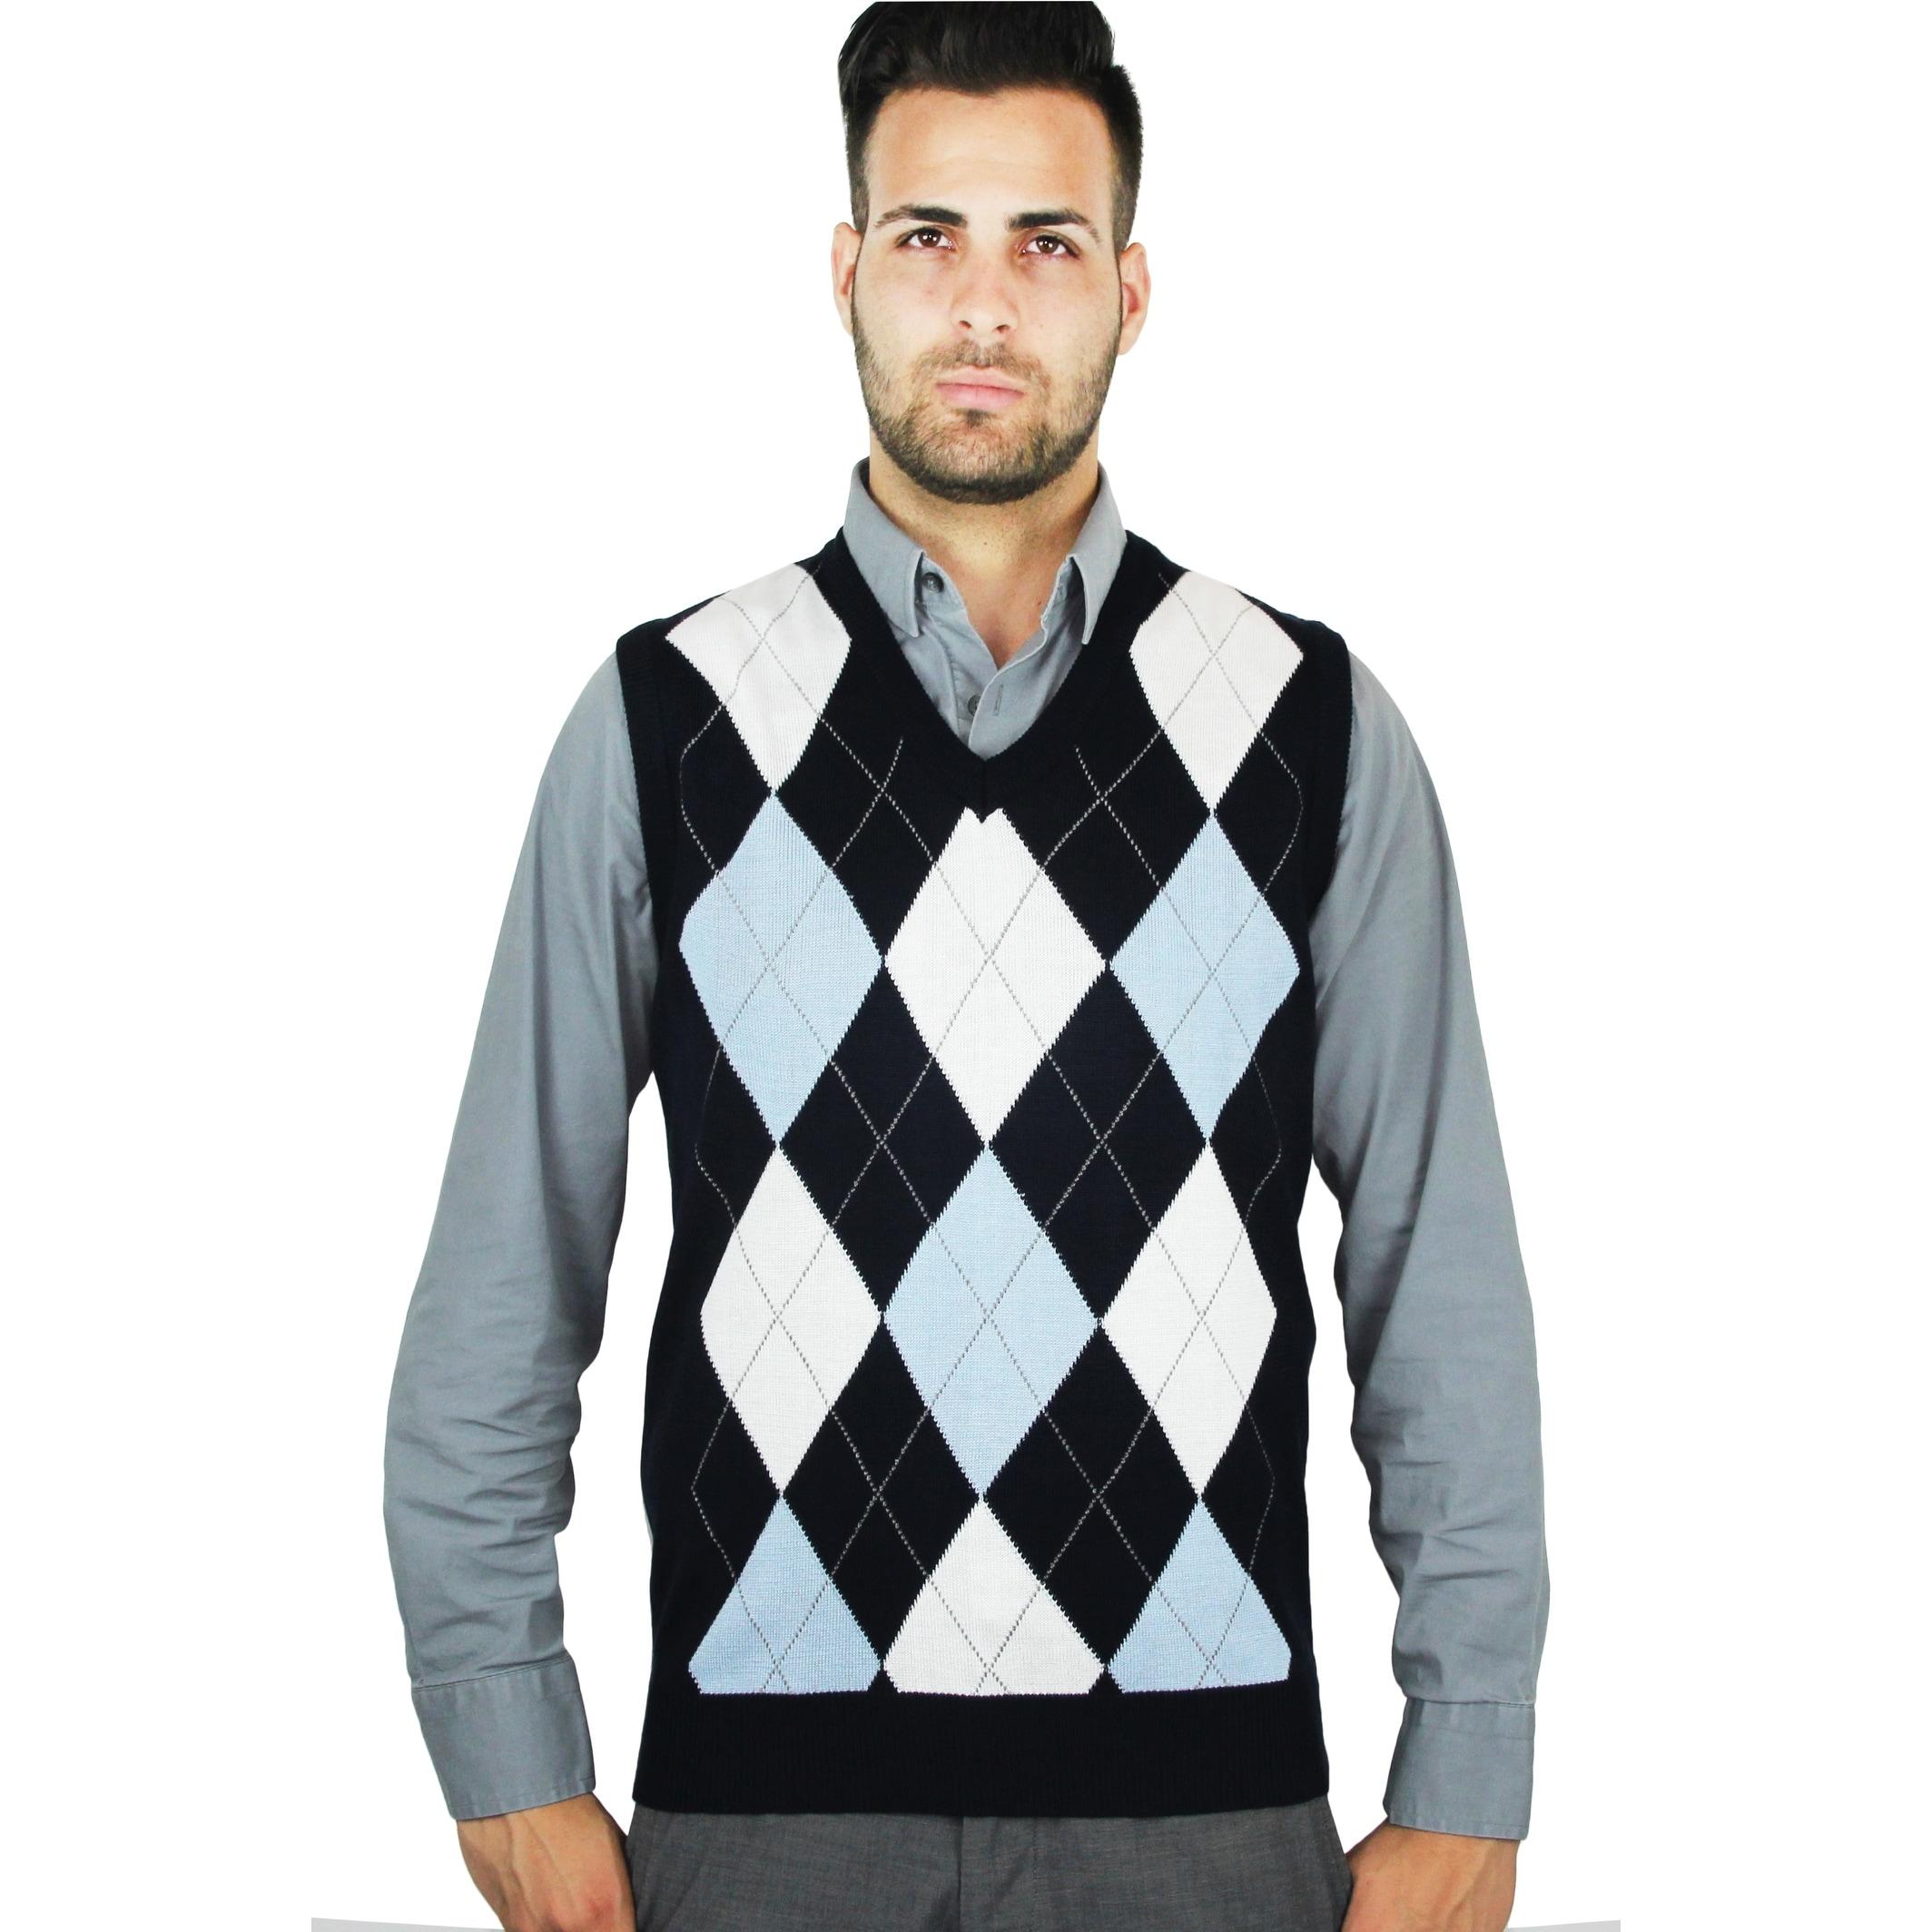 Men's Argyle Sweater Vest (SV-255) - Overstock - 23500821